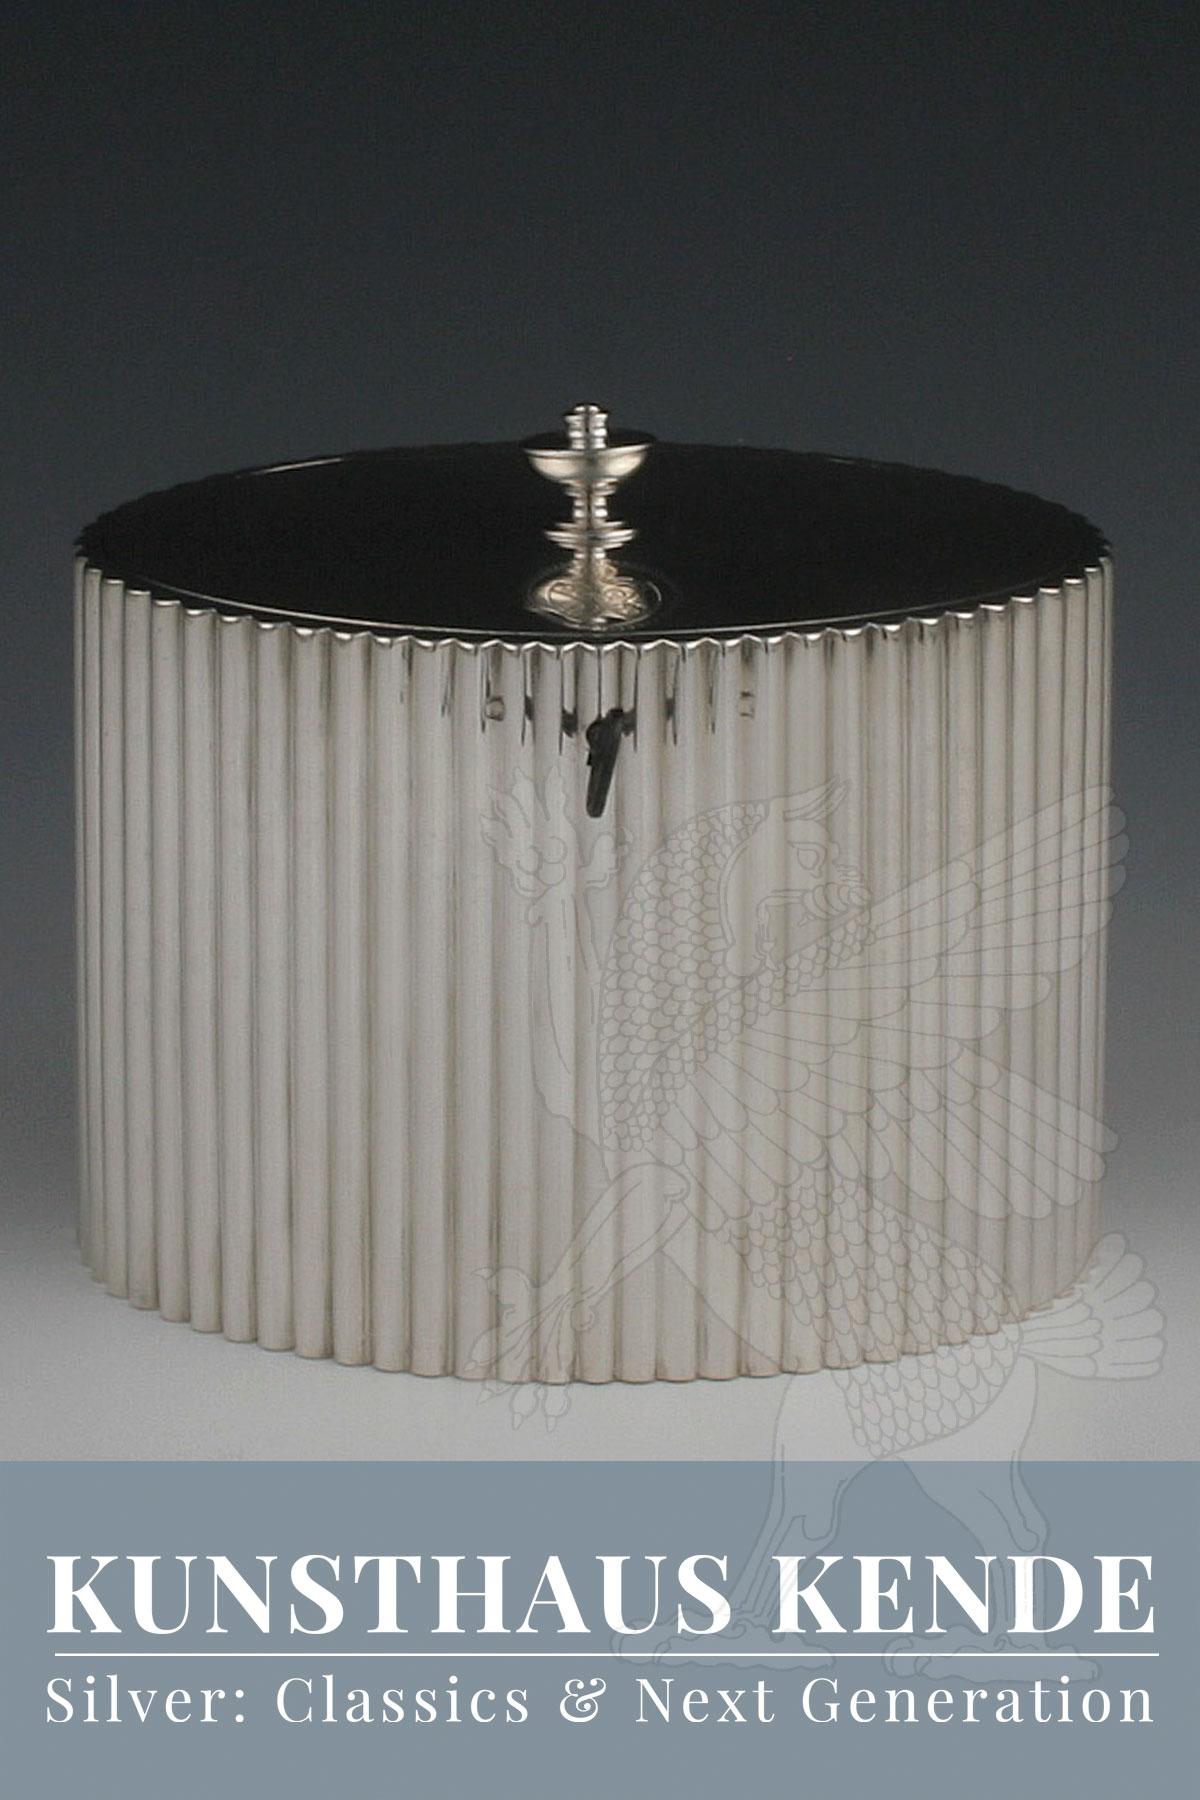 teedose sterling silber London 1786 englische dose caddy antik joseph angell